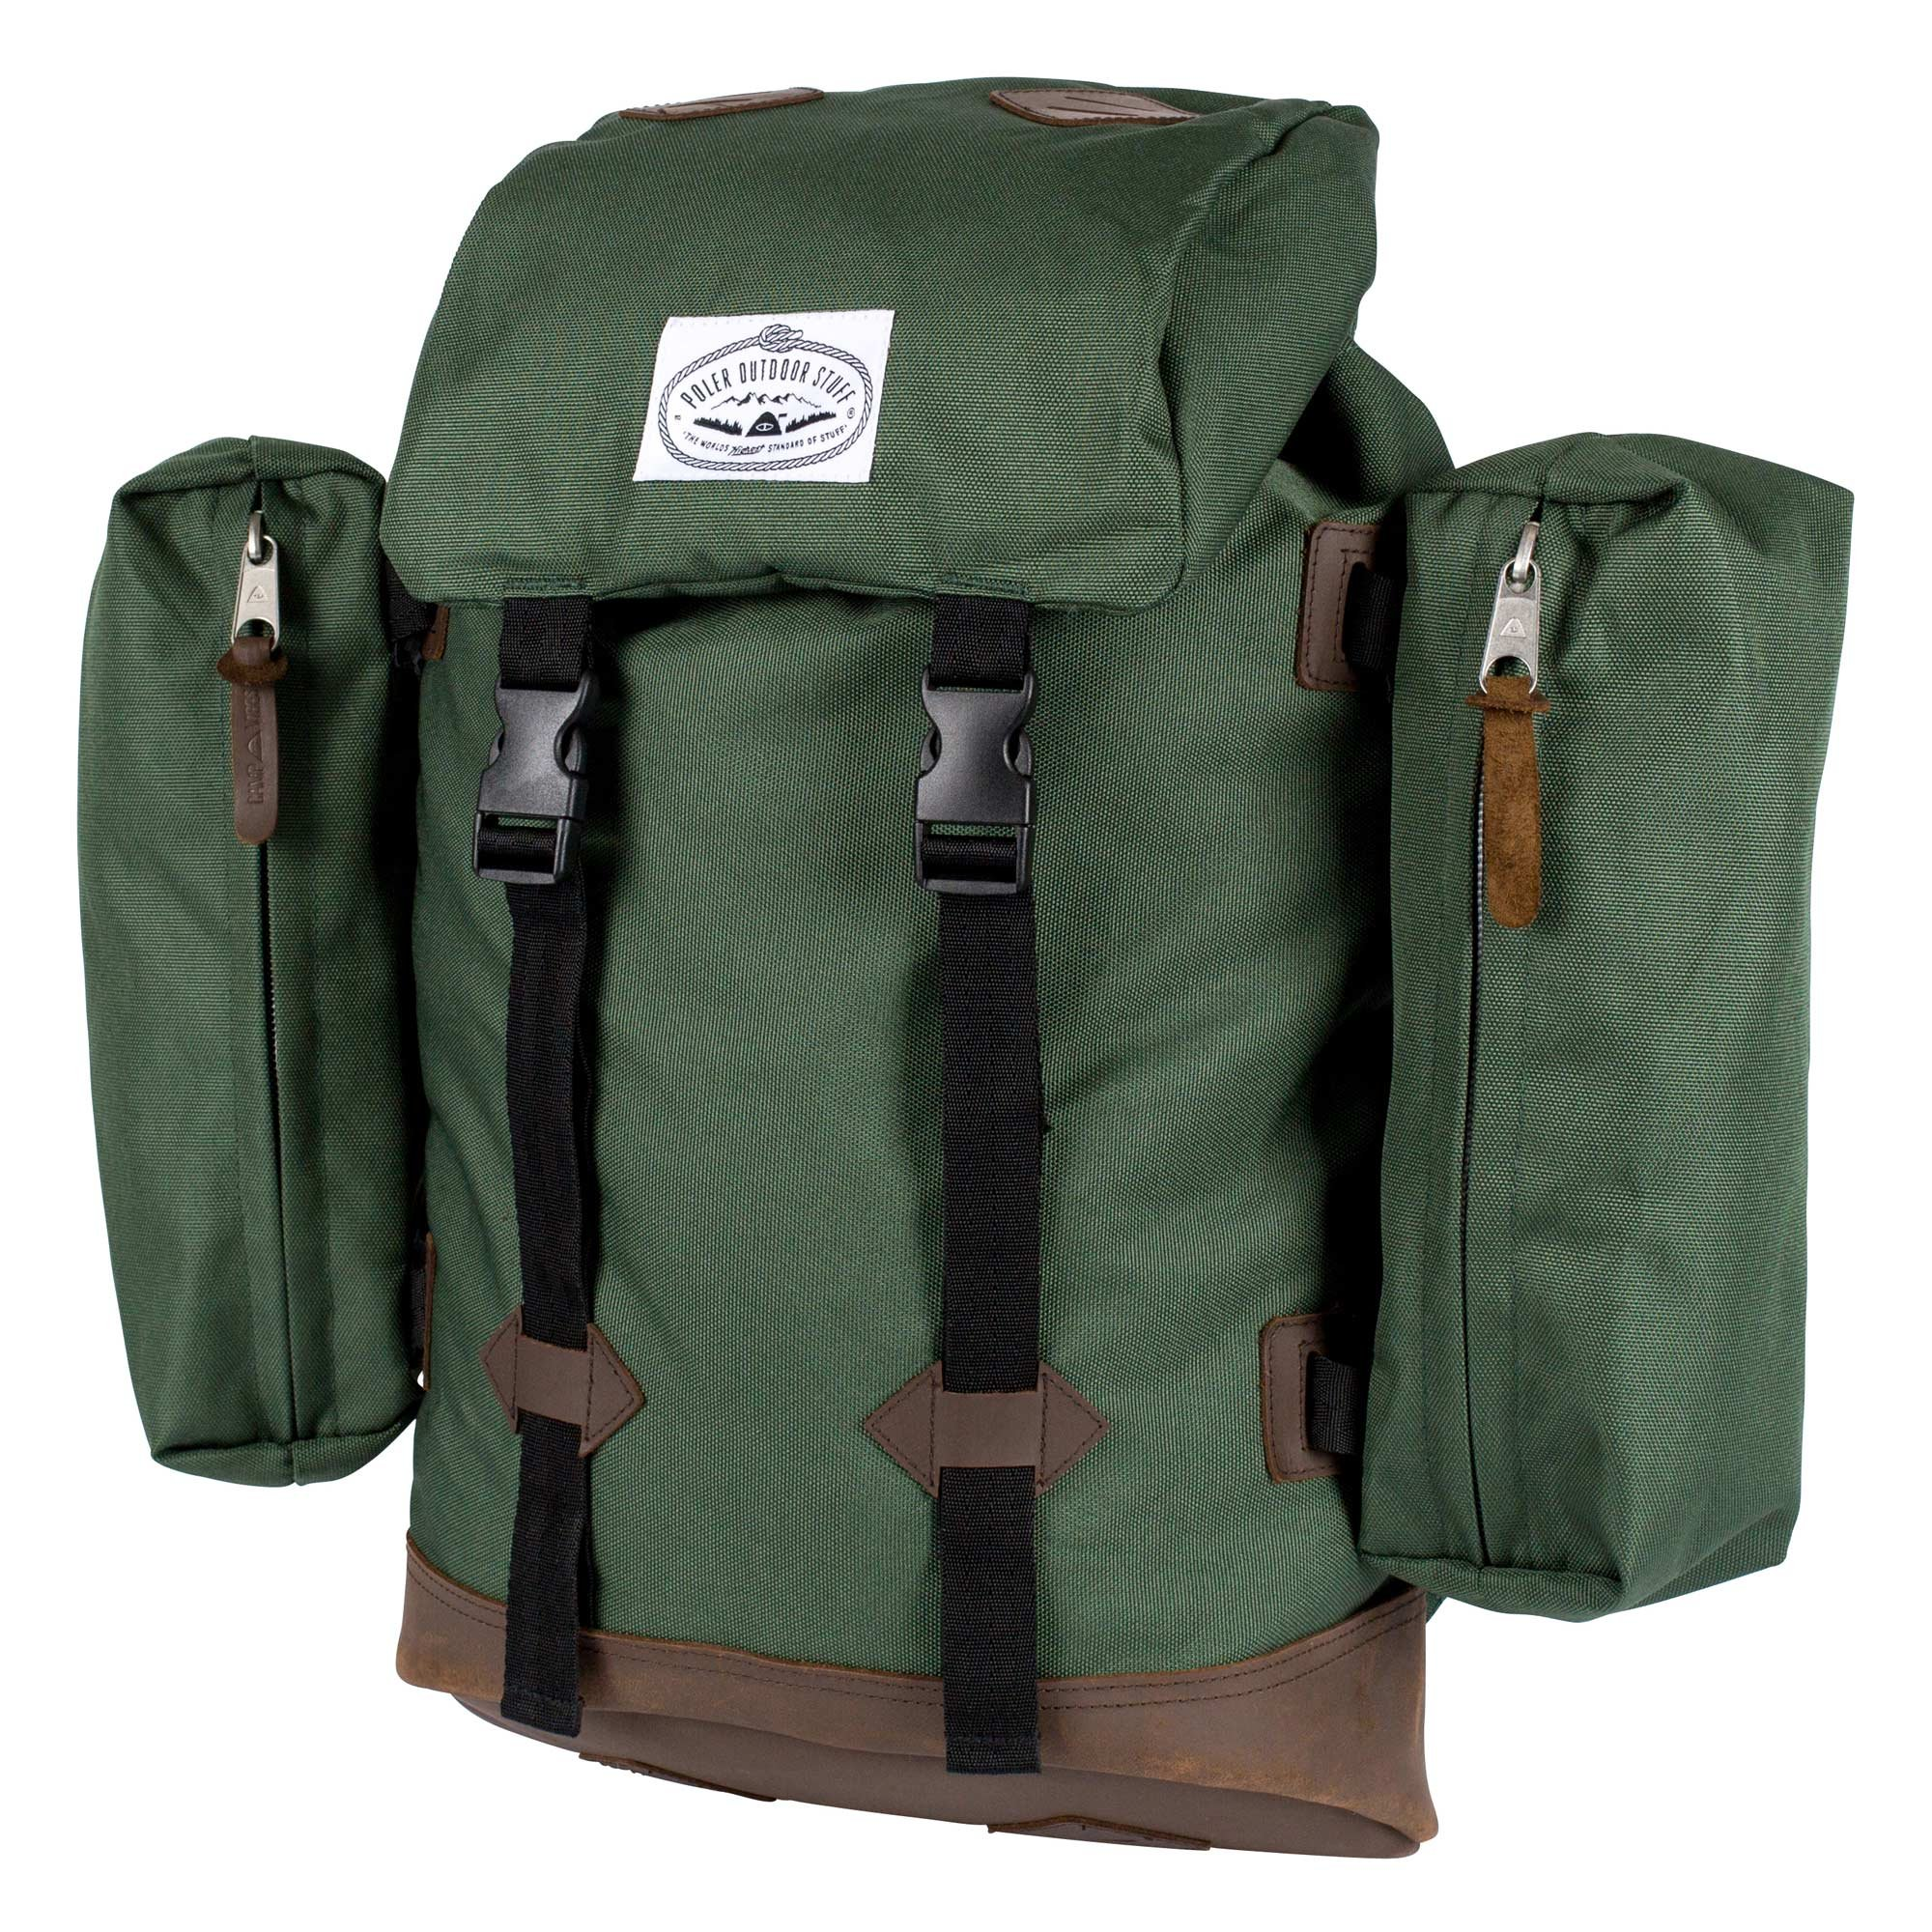 Poler Unisex Classic Rucksack Bag, Leaf Green, One Size